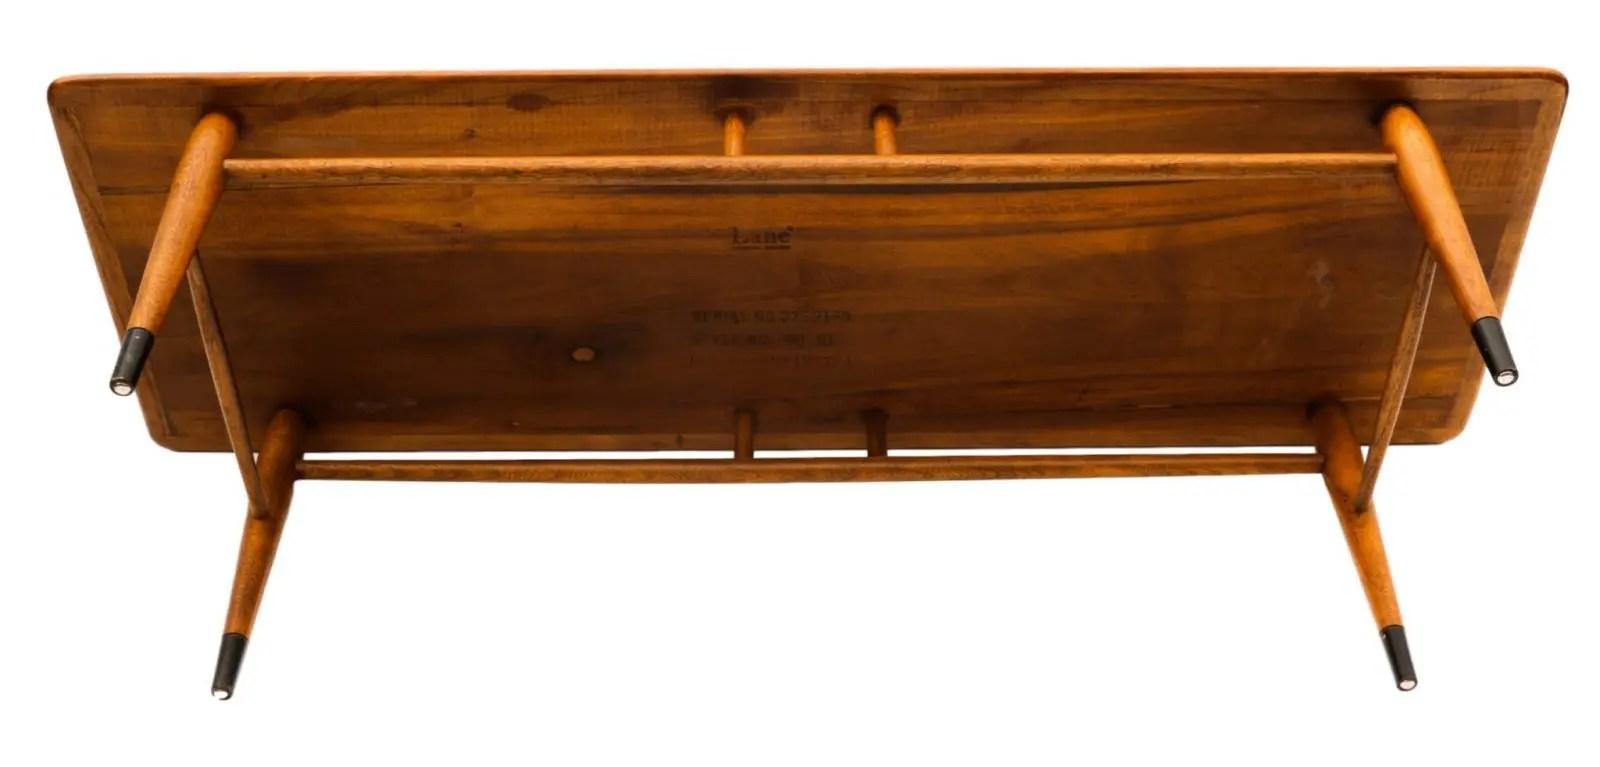 Mid-Century Modern Furniture LANE Coffee Table Inlaid